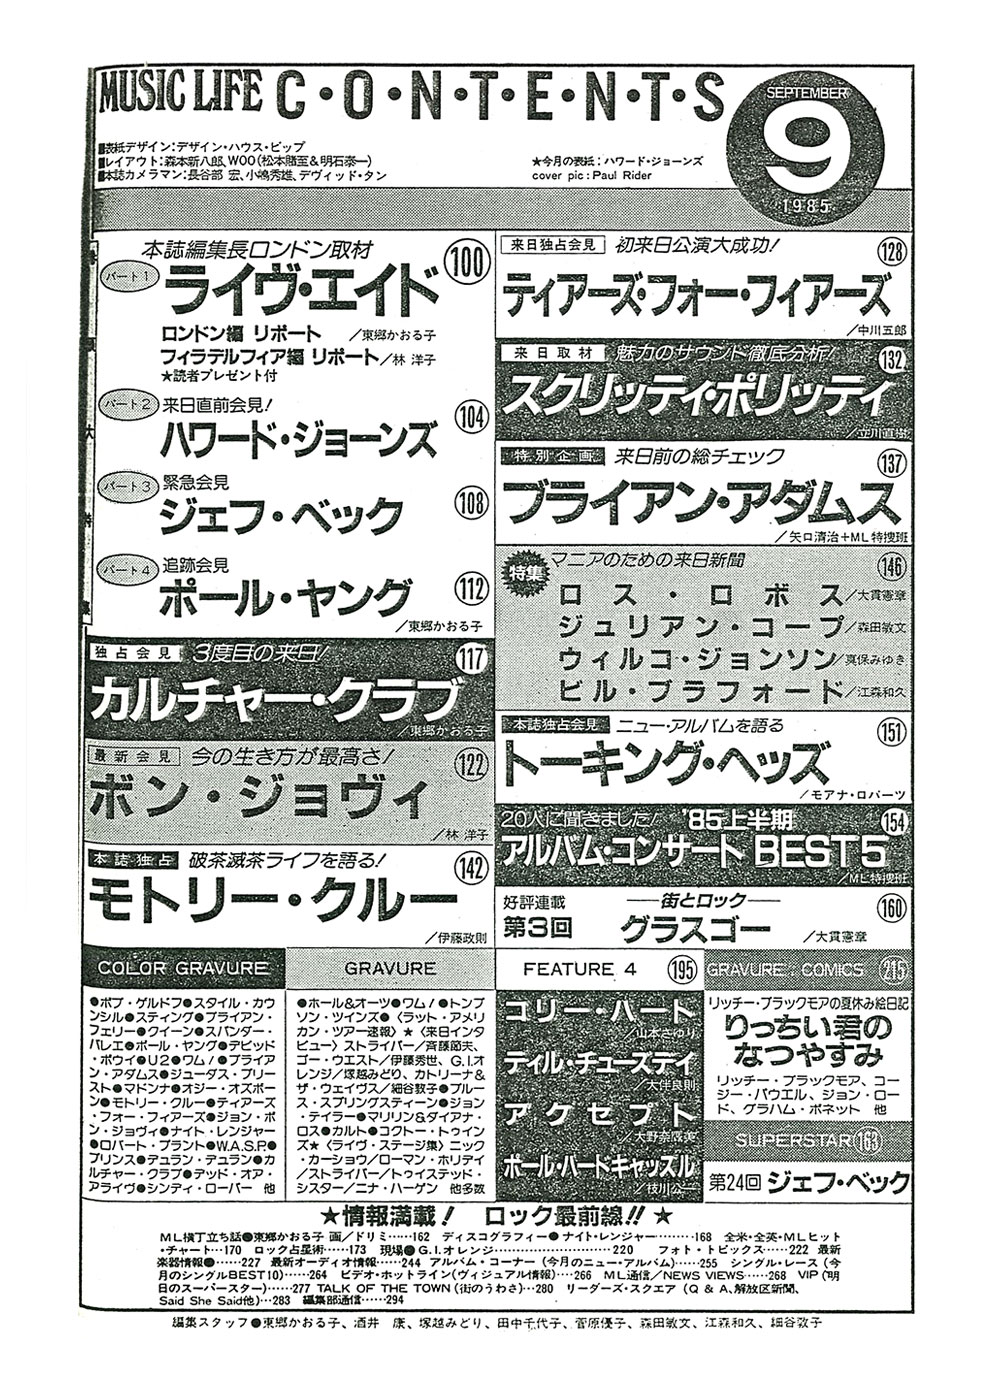 MUSIC LIFE 1985年9月号目次